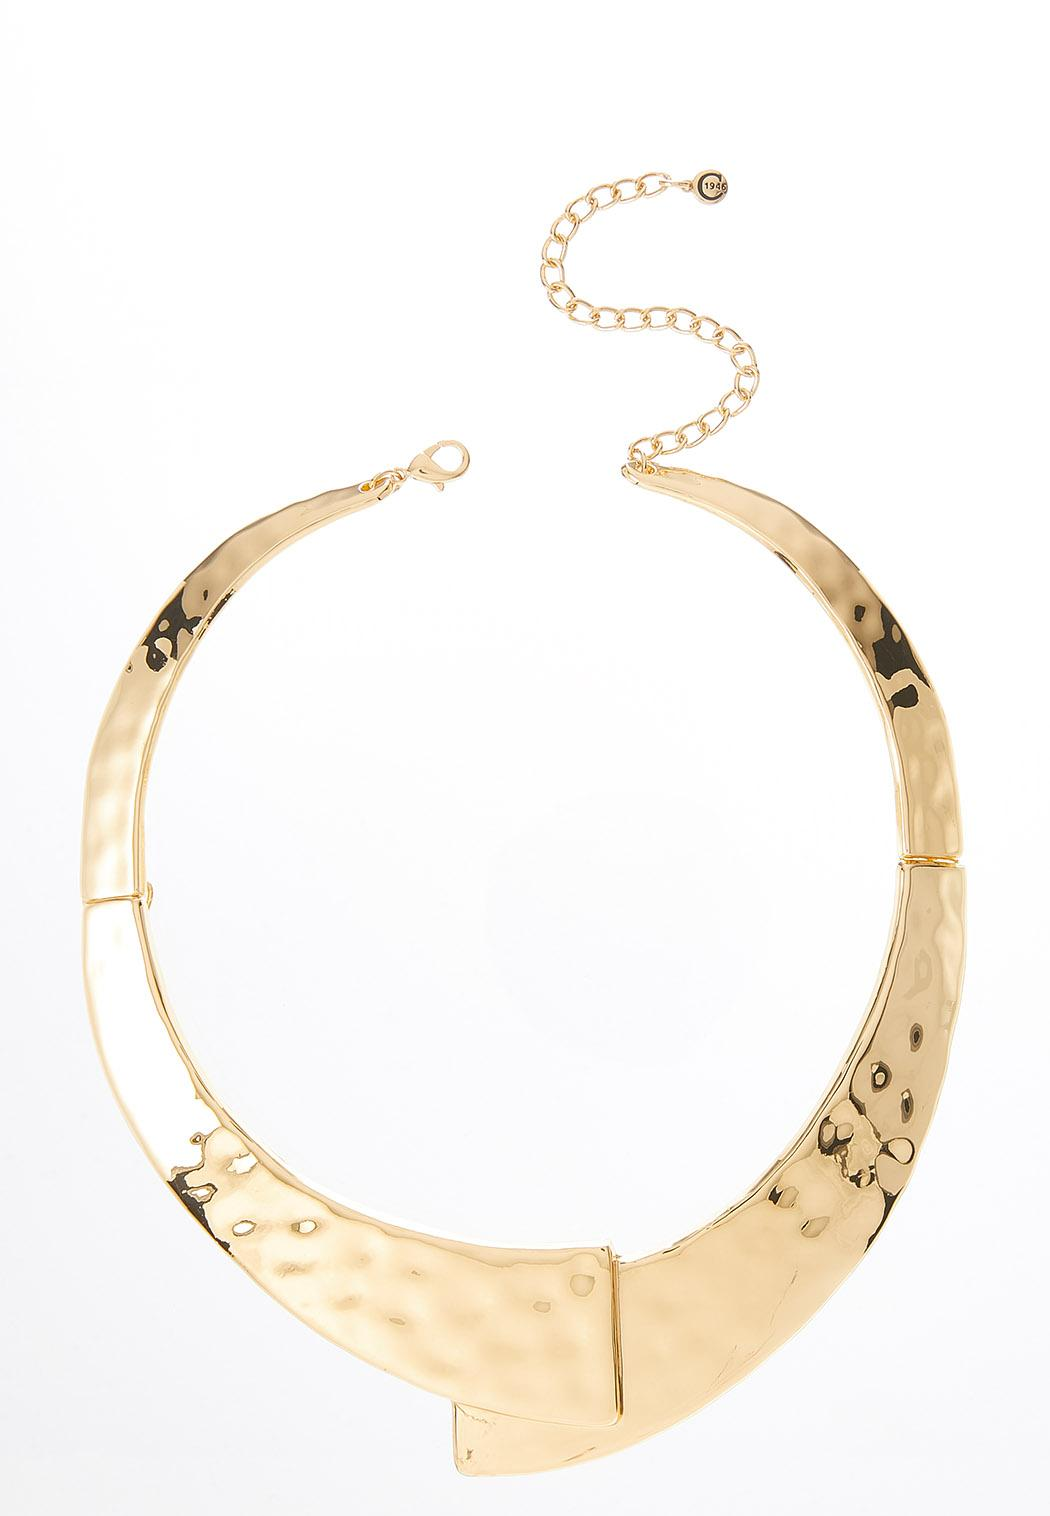 Hammered Gold Bib Necklace